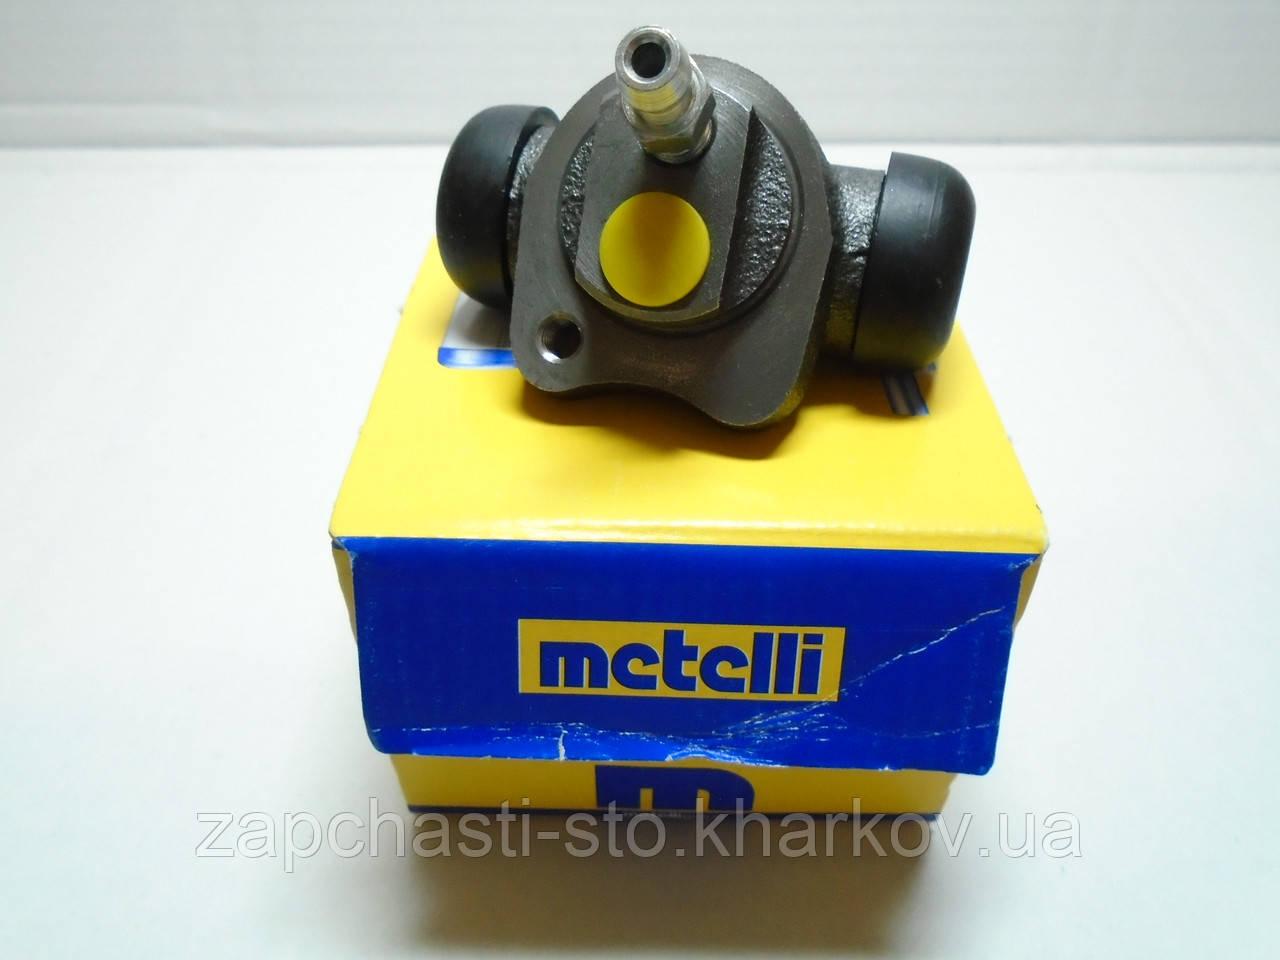 Задний тормозной цилиндр Aveo, Nexia 1 отверстие Metelli